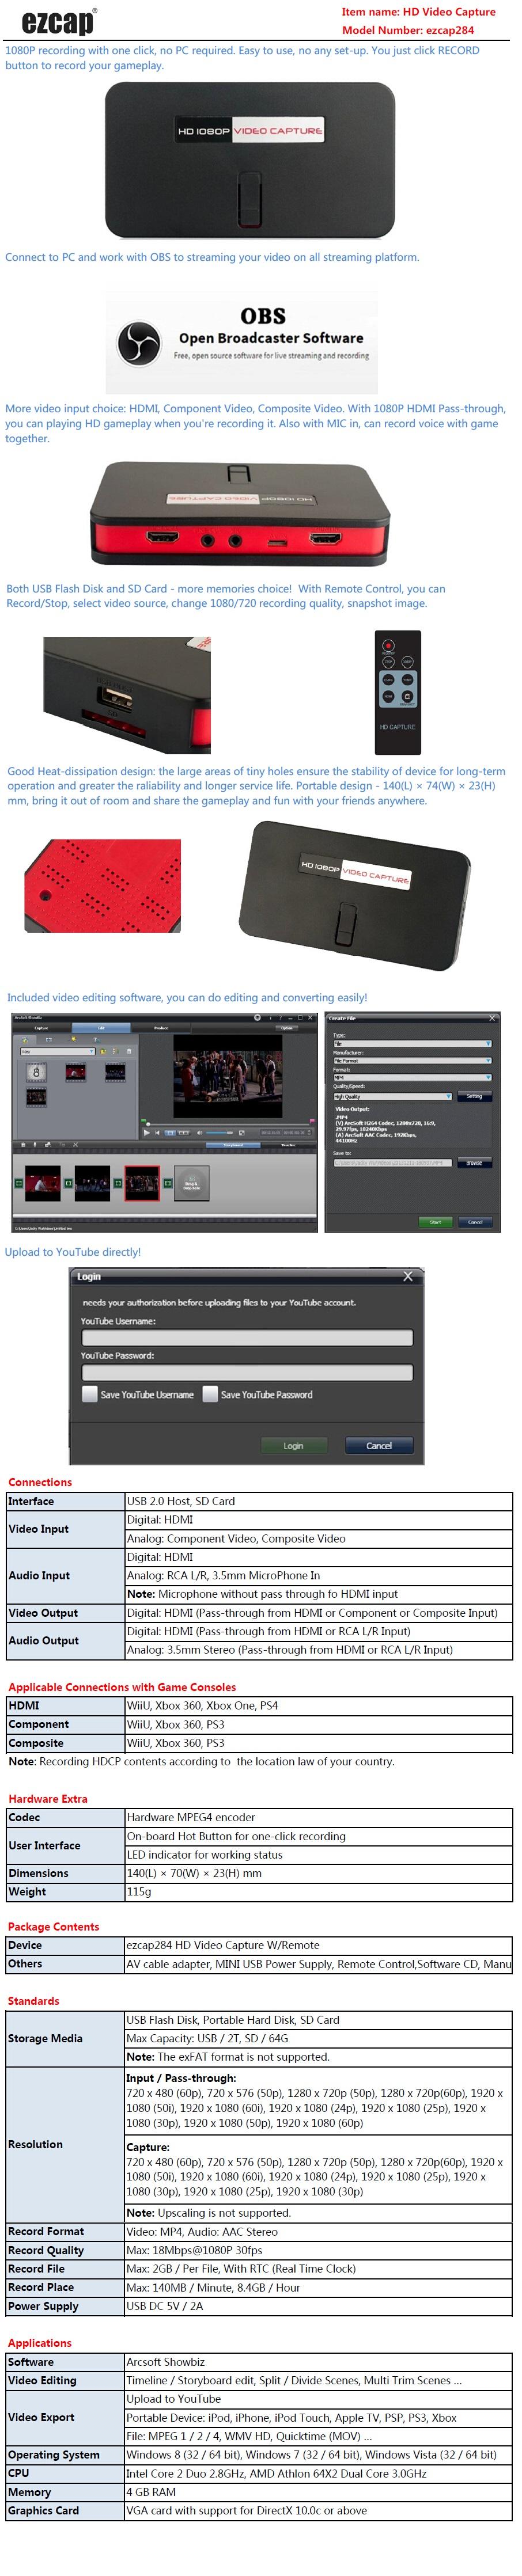 Generic OBS Live Broadcast Game Video Capture EZCAP 284 HDMI